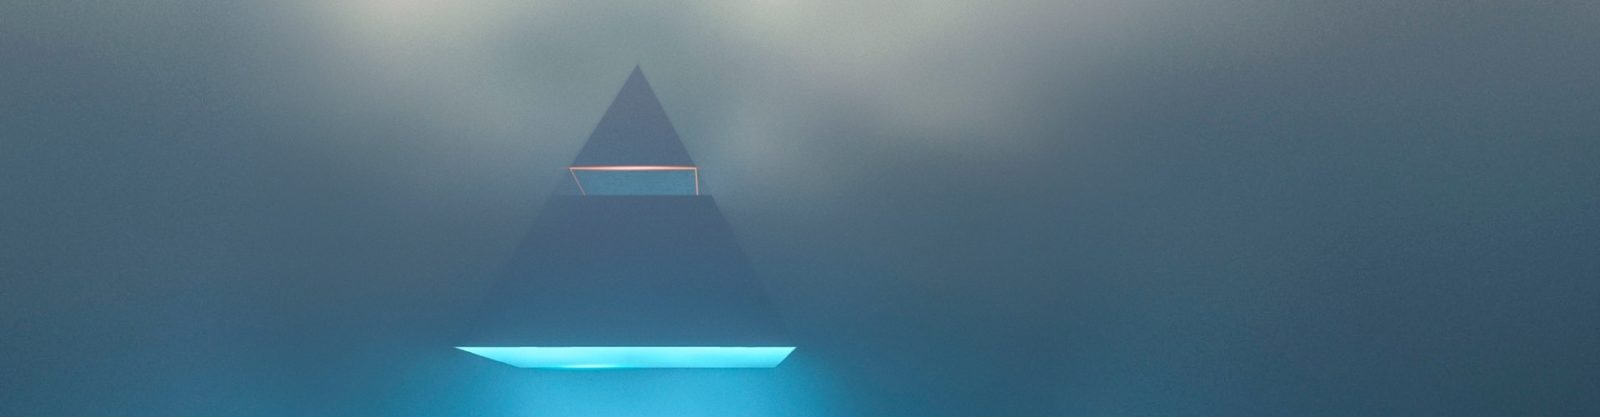 Инфографика в виде пирамид